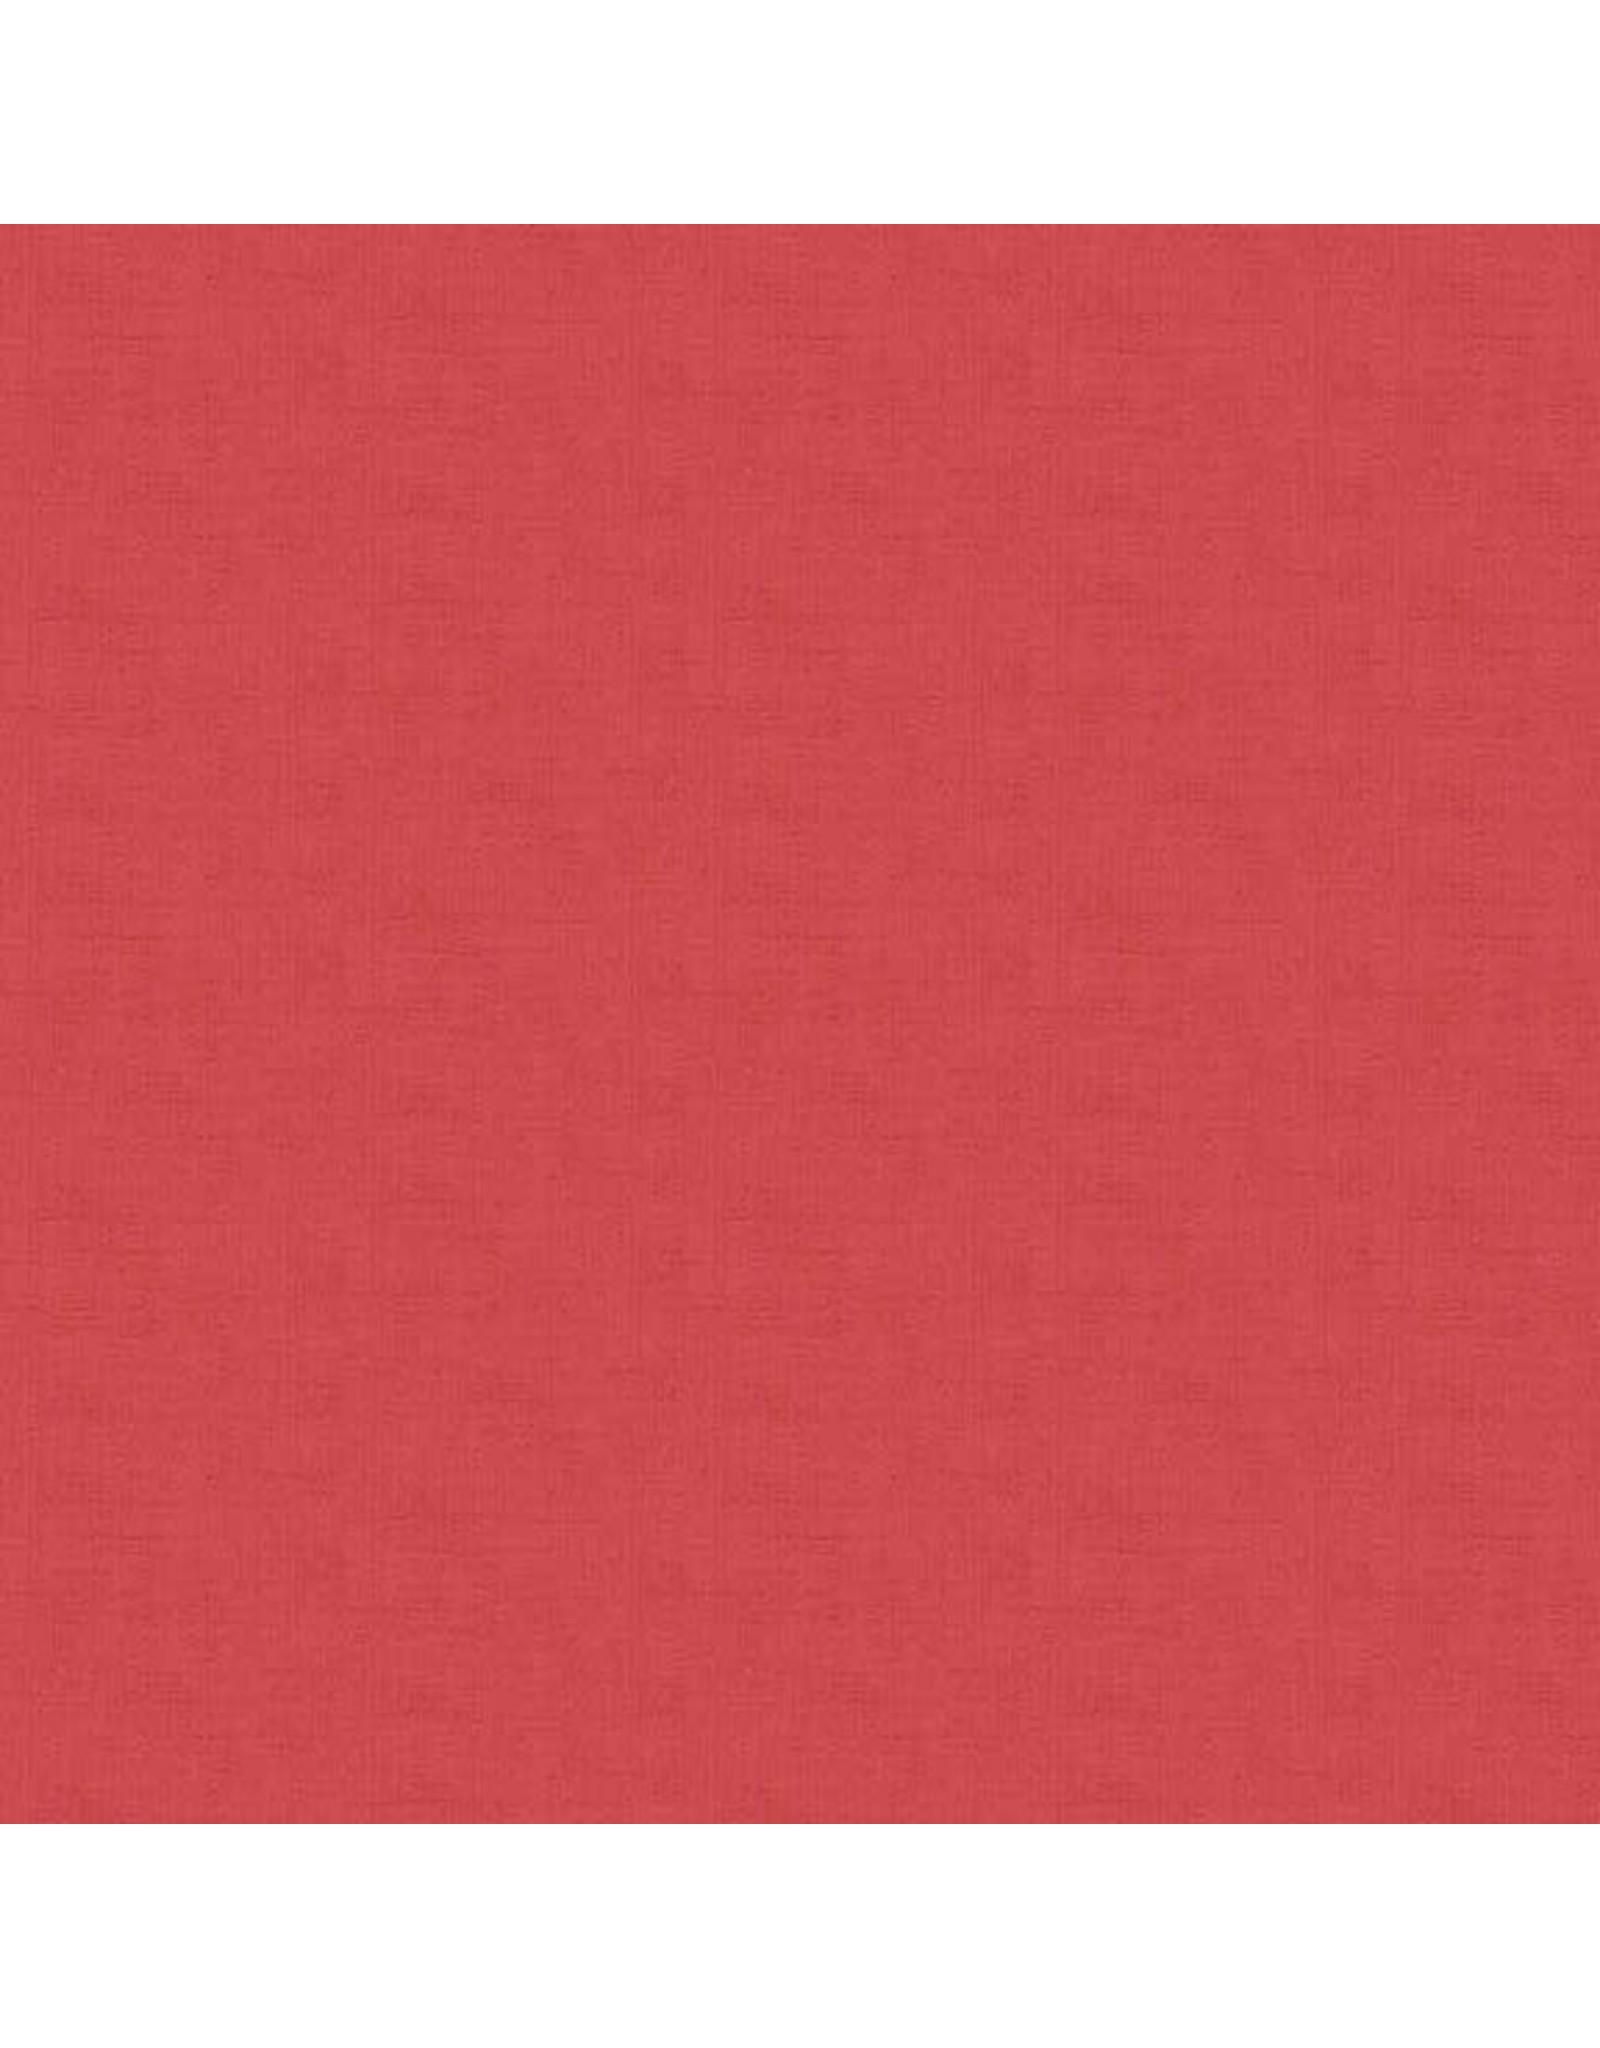 Makower UK Linen Texture - Old Rose